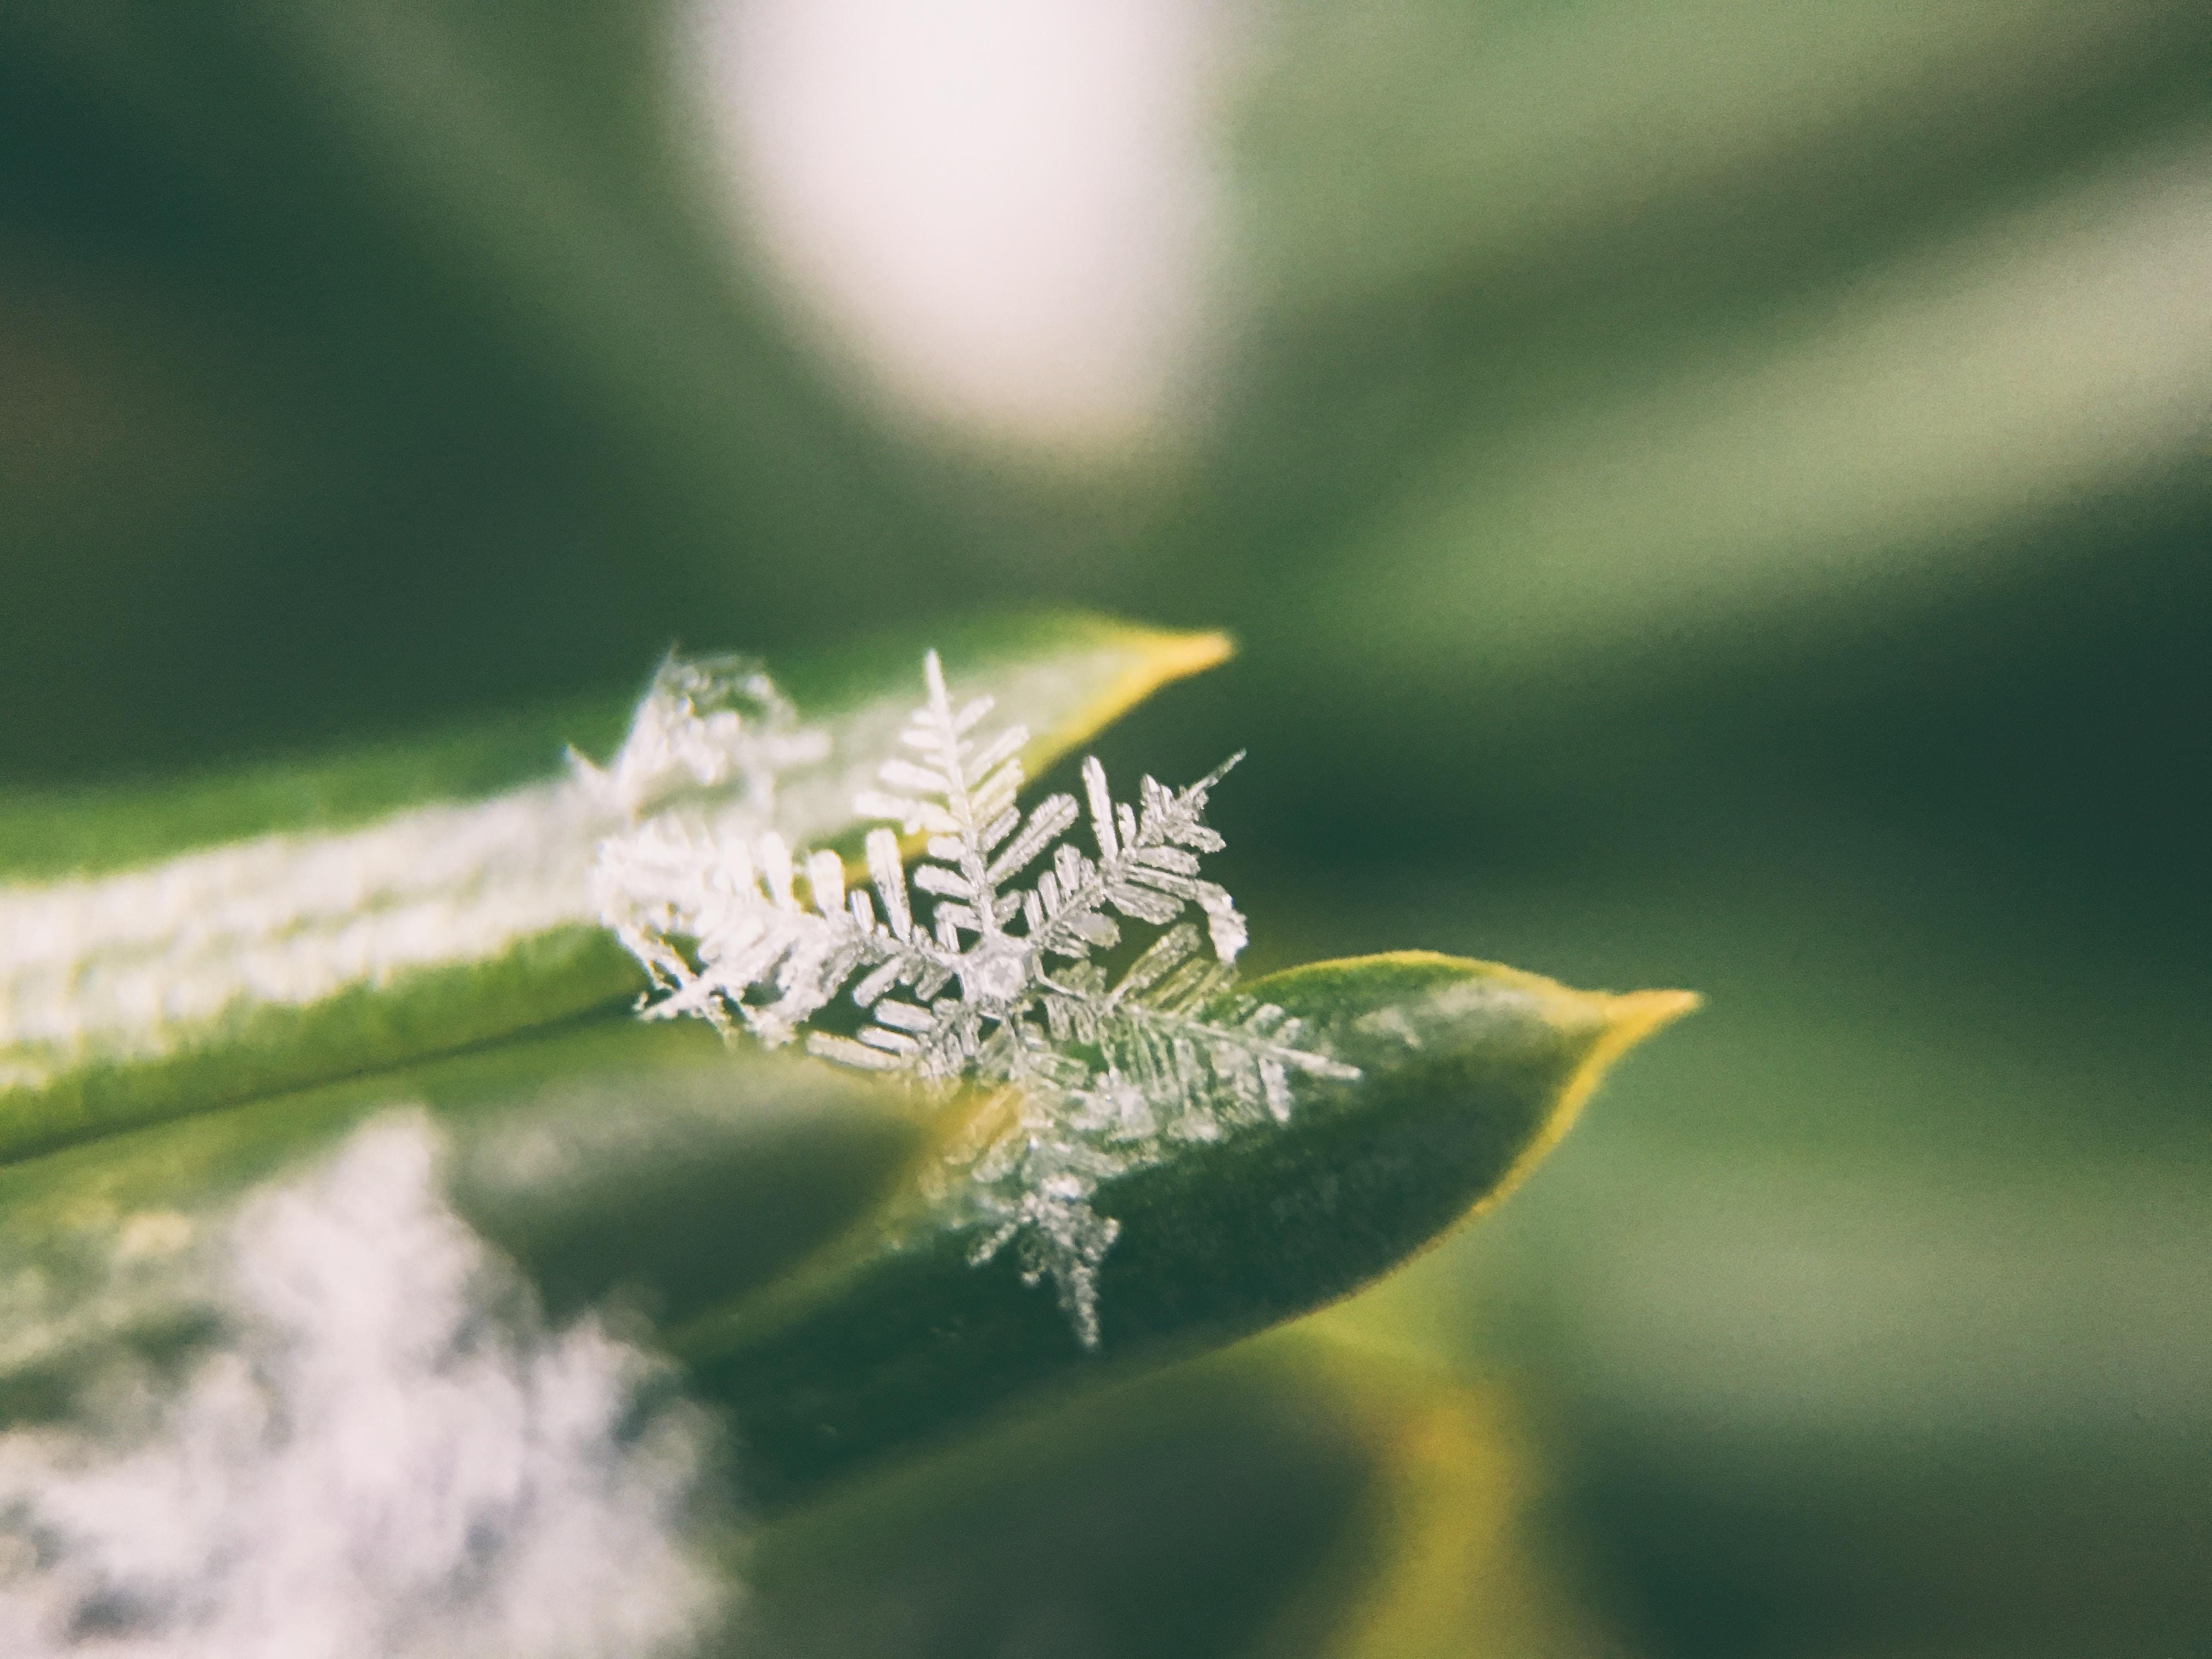 focus photo of snowflakes